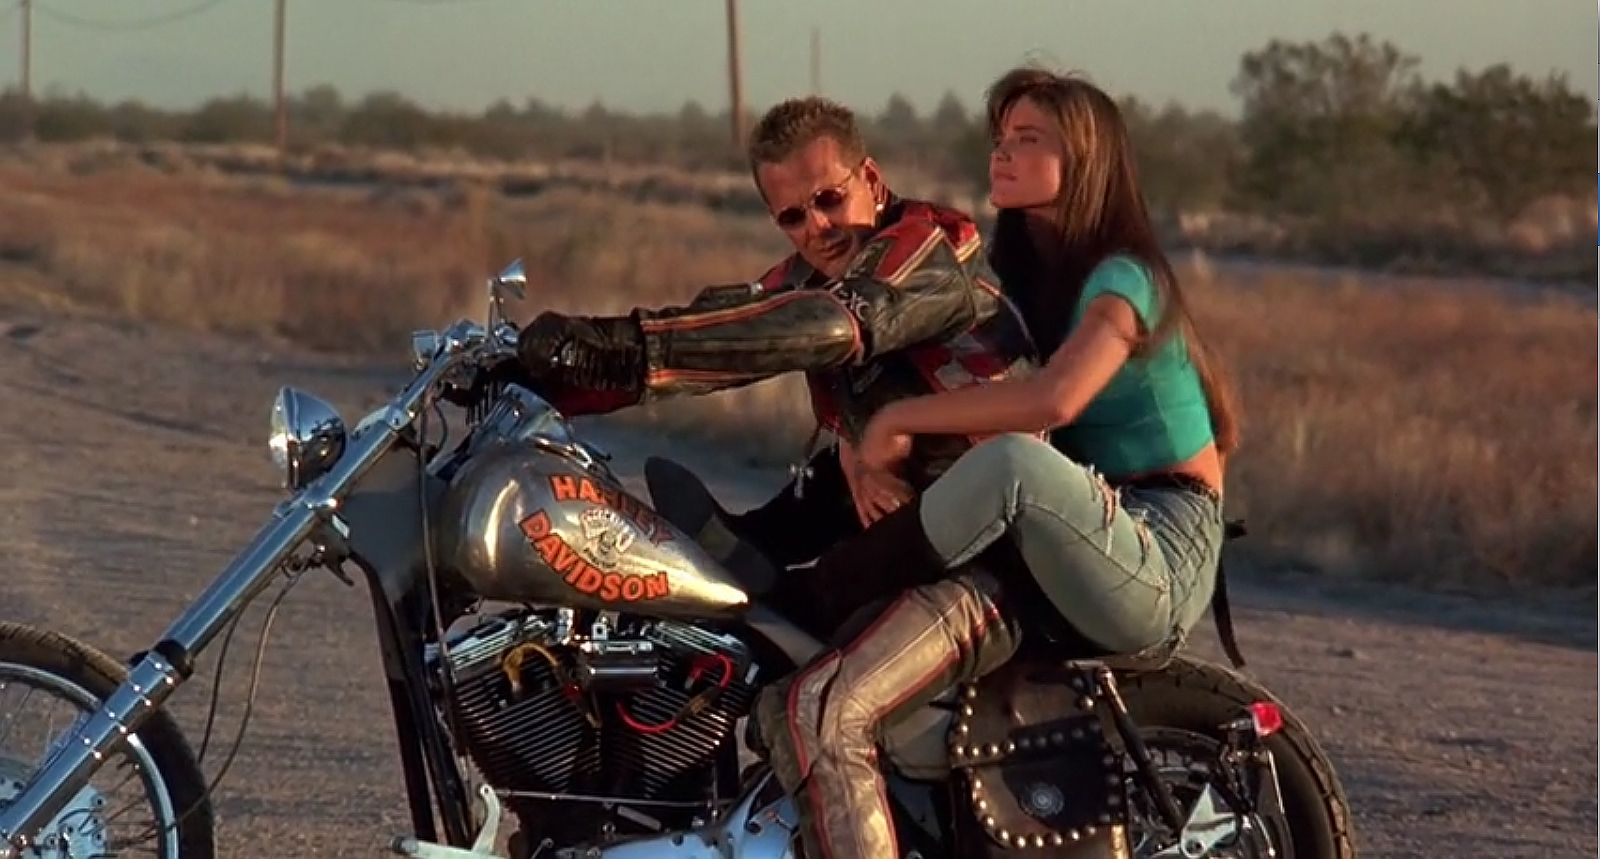 Harley Davidson Movie: Movie QuotHarley Davidson And The Marlboro Manquot